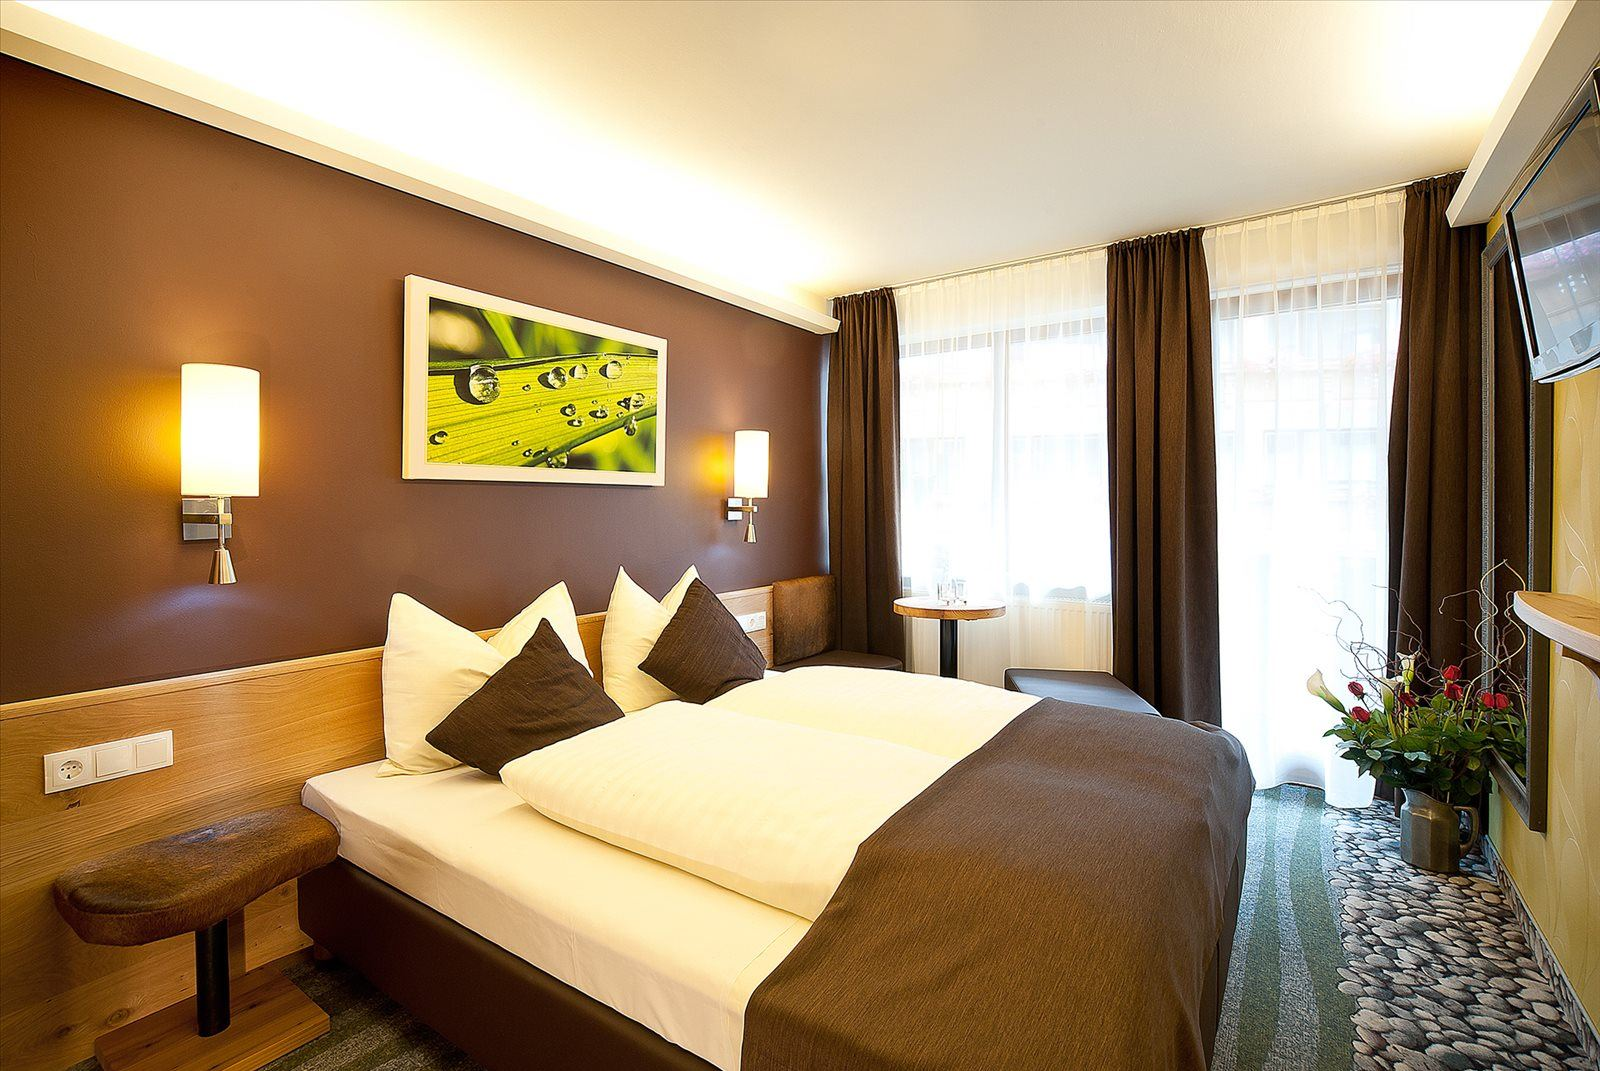 Hotel Tirolerhof - Mayrhofen